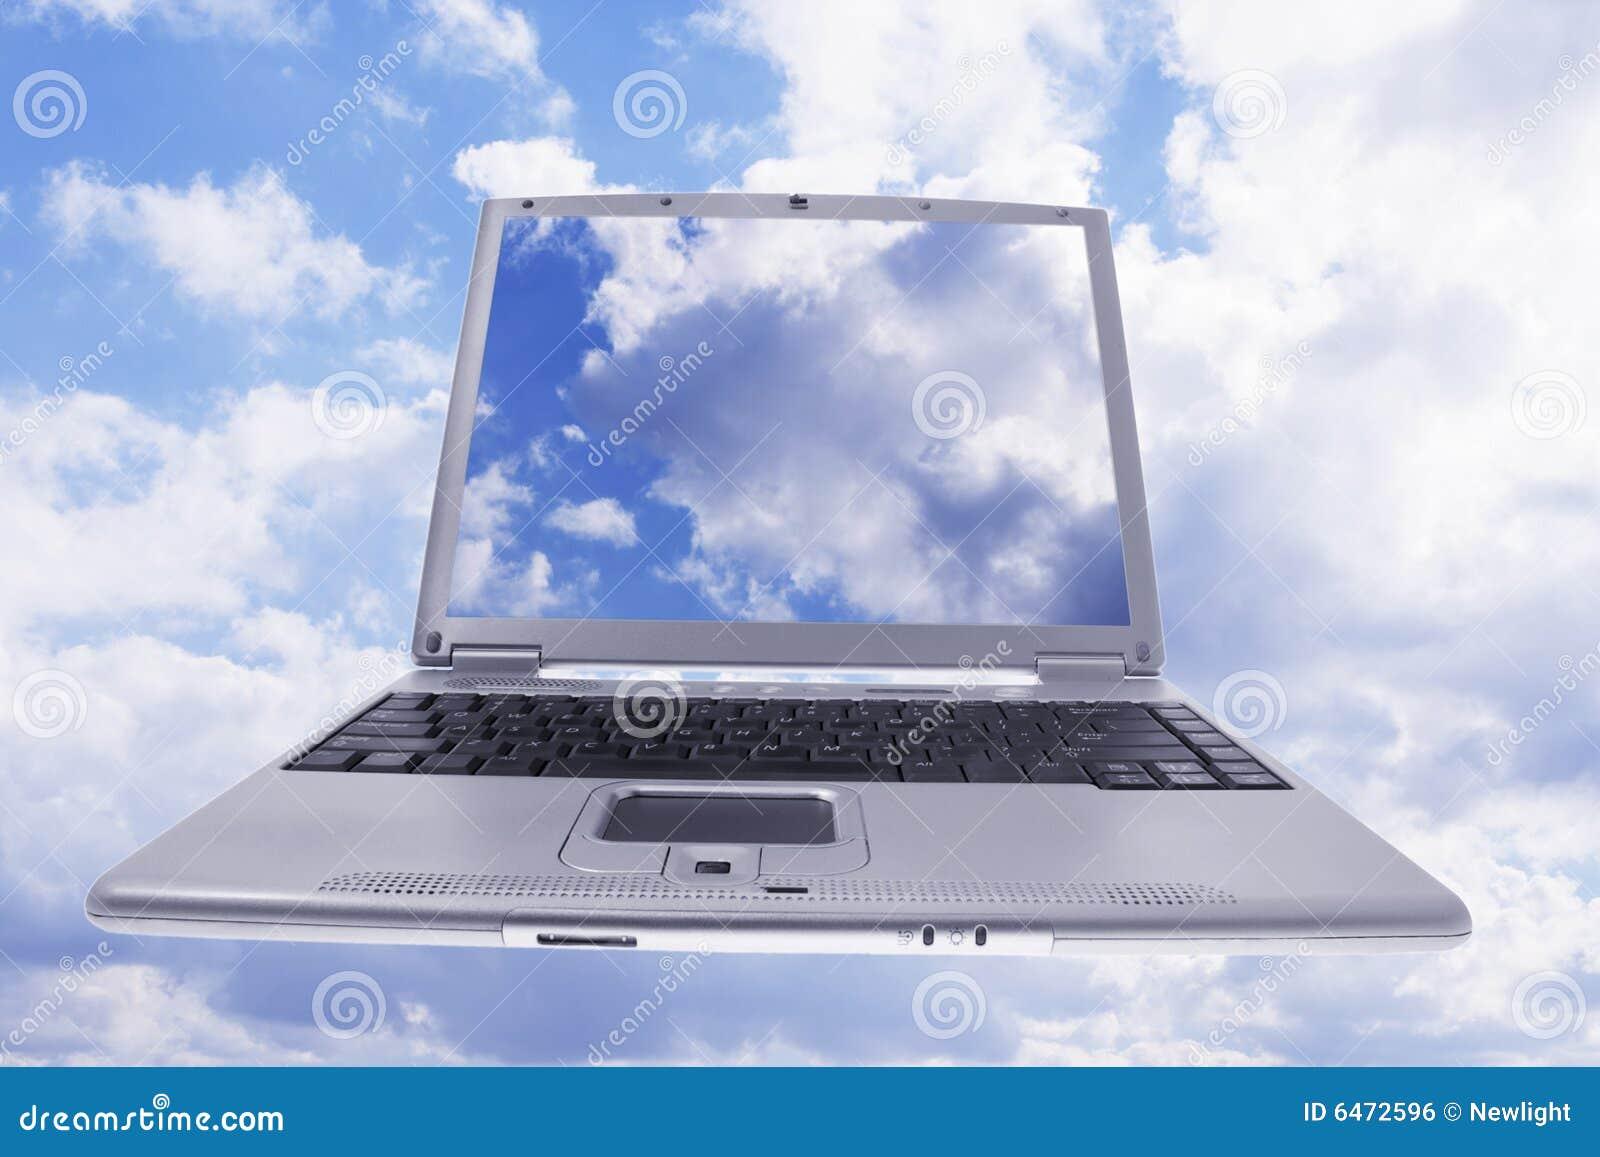 Labtop komputerowy